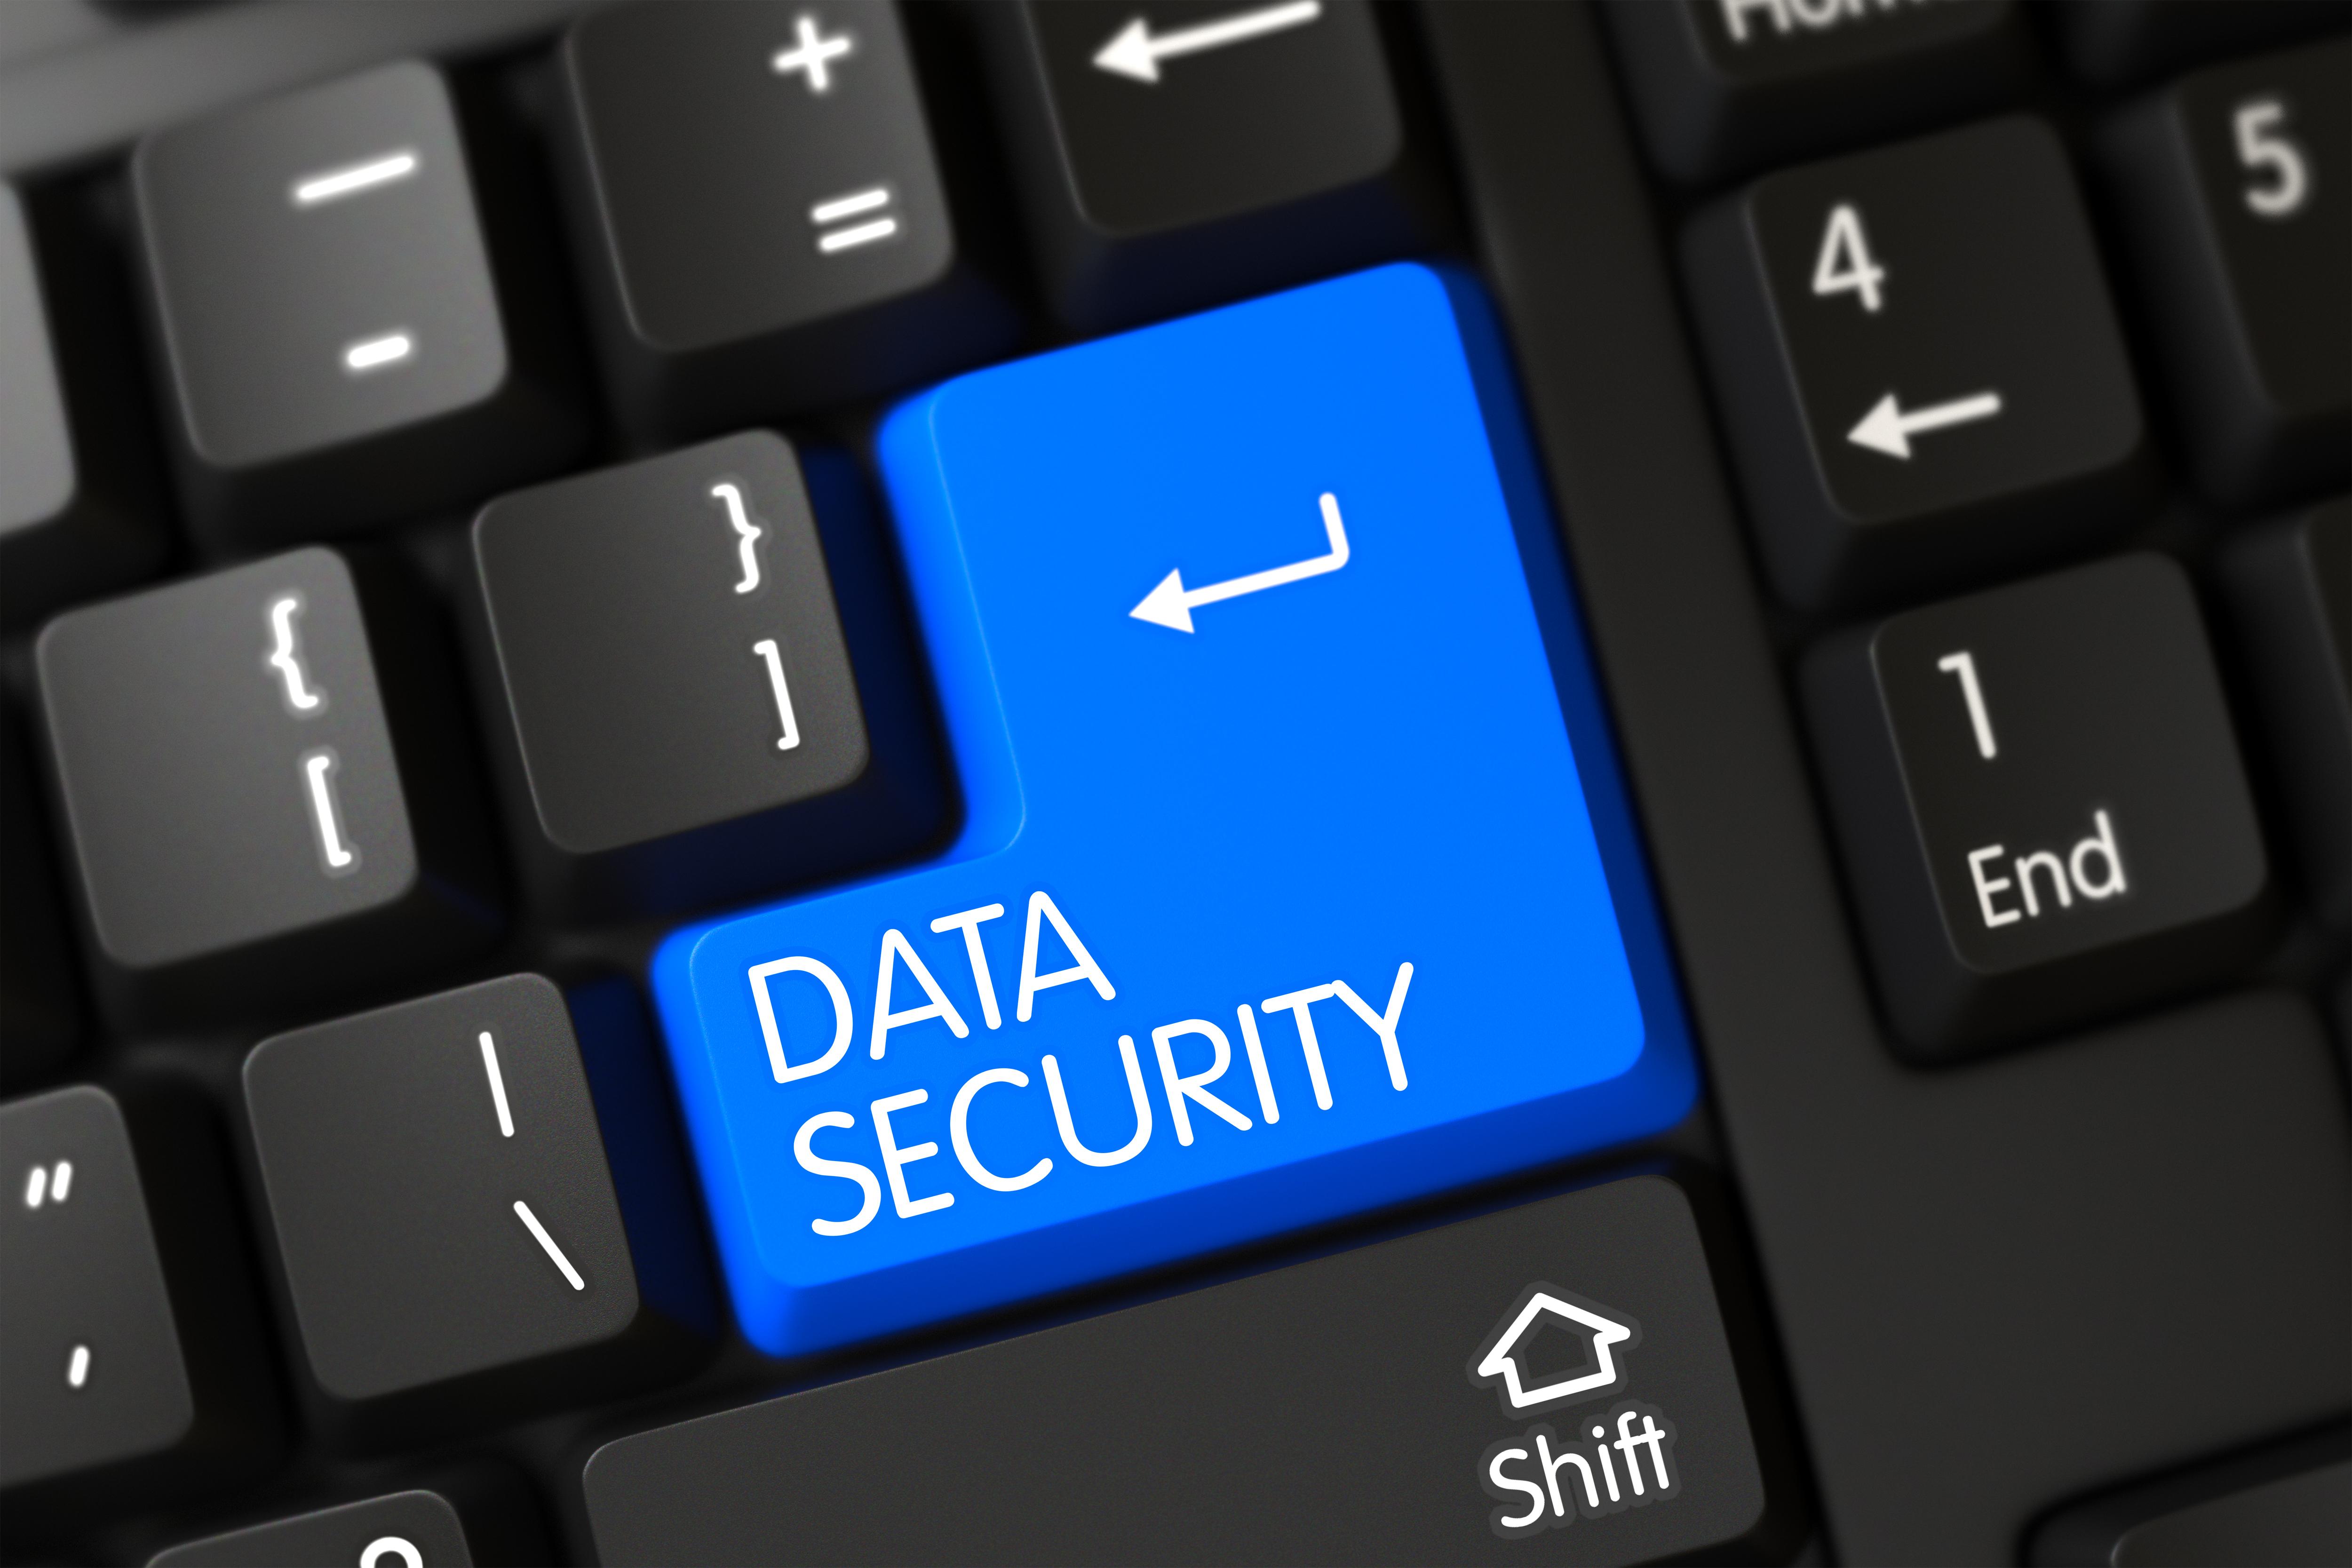 Key Data Security on Modernized Keyboard. Black Keyboard with the words Data Security on Blue Key. Data Security on Black Keyboard Background. Data Security Key. 3D Render.